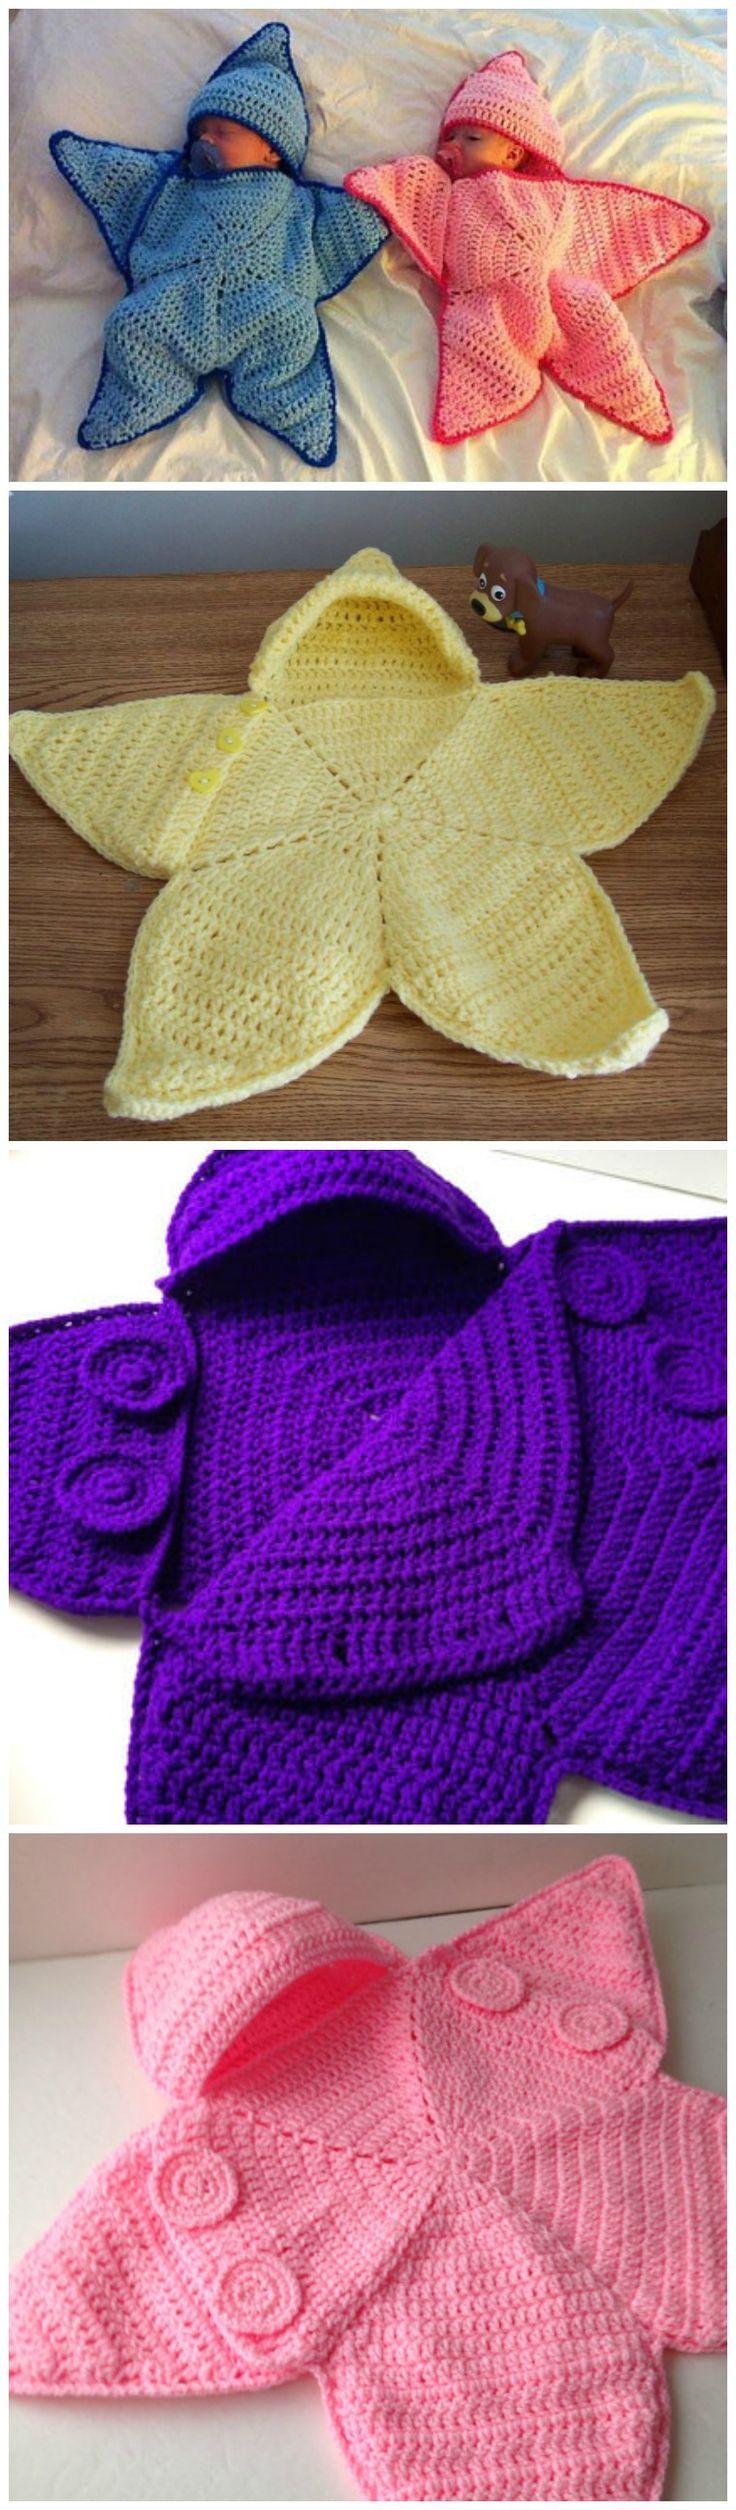 Crochet Baby Bunting Twinkle Star Baby Toddler Crochet